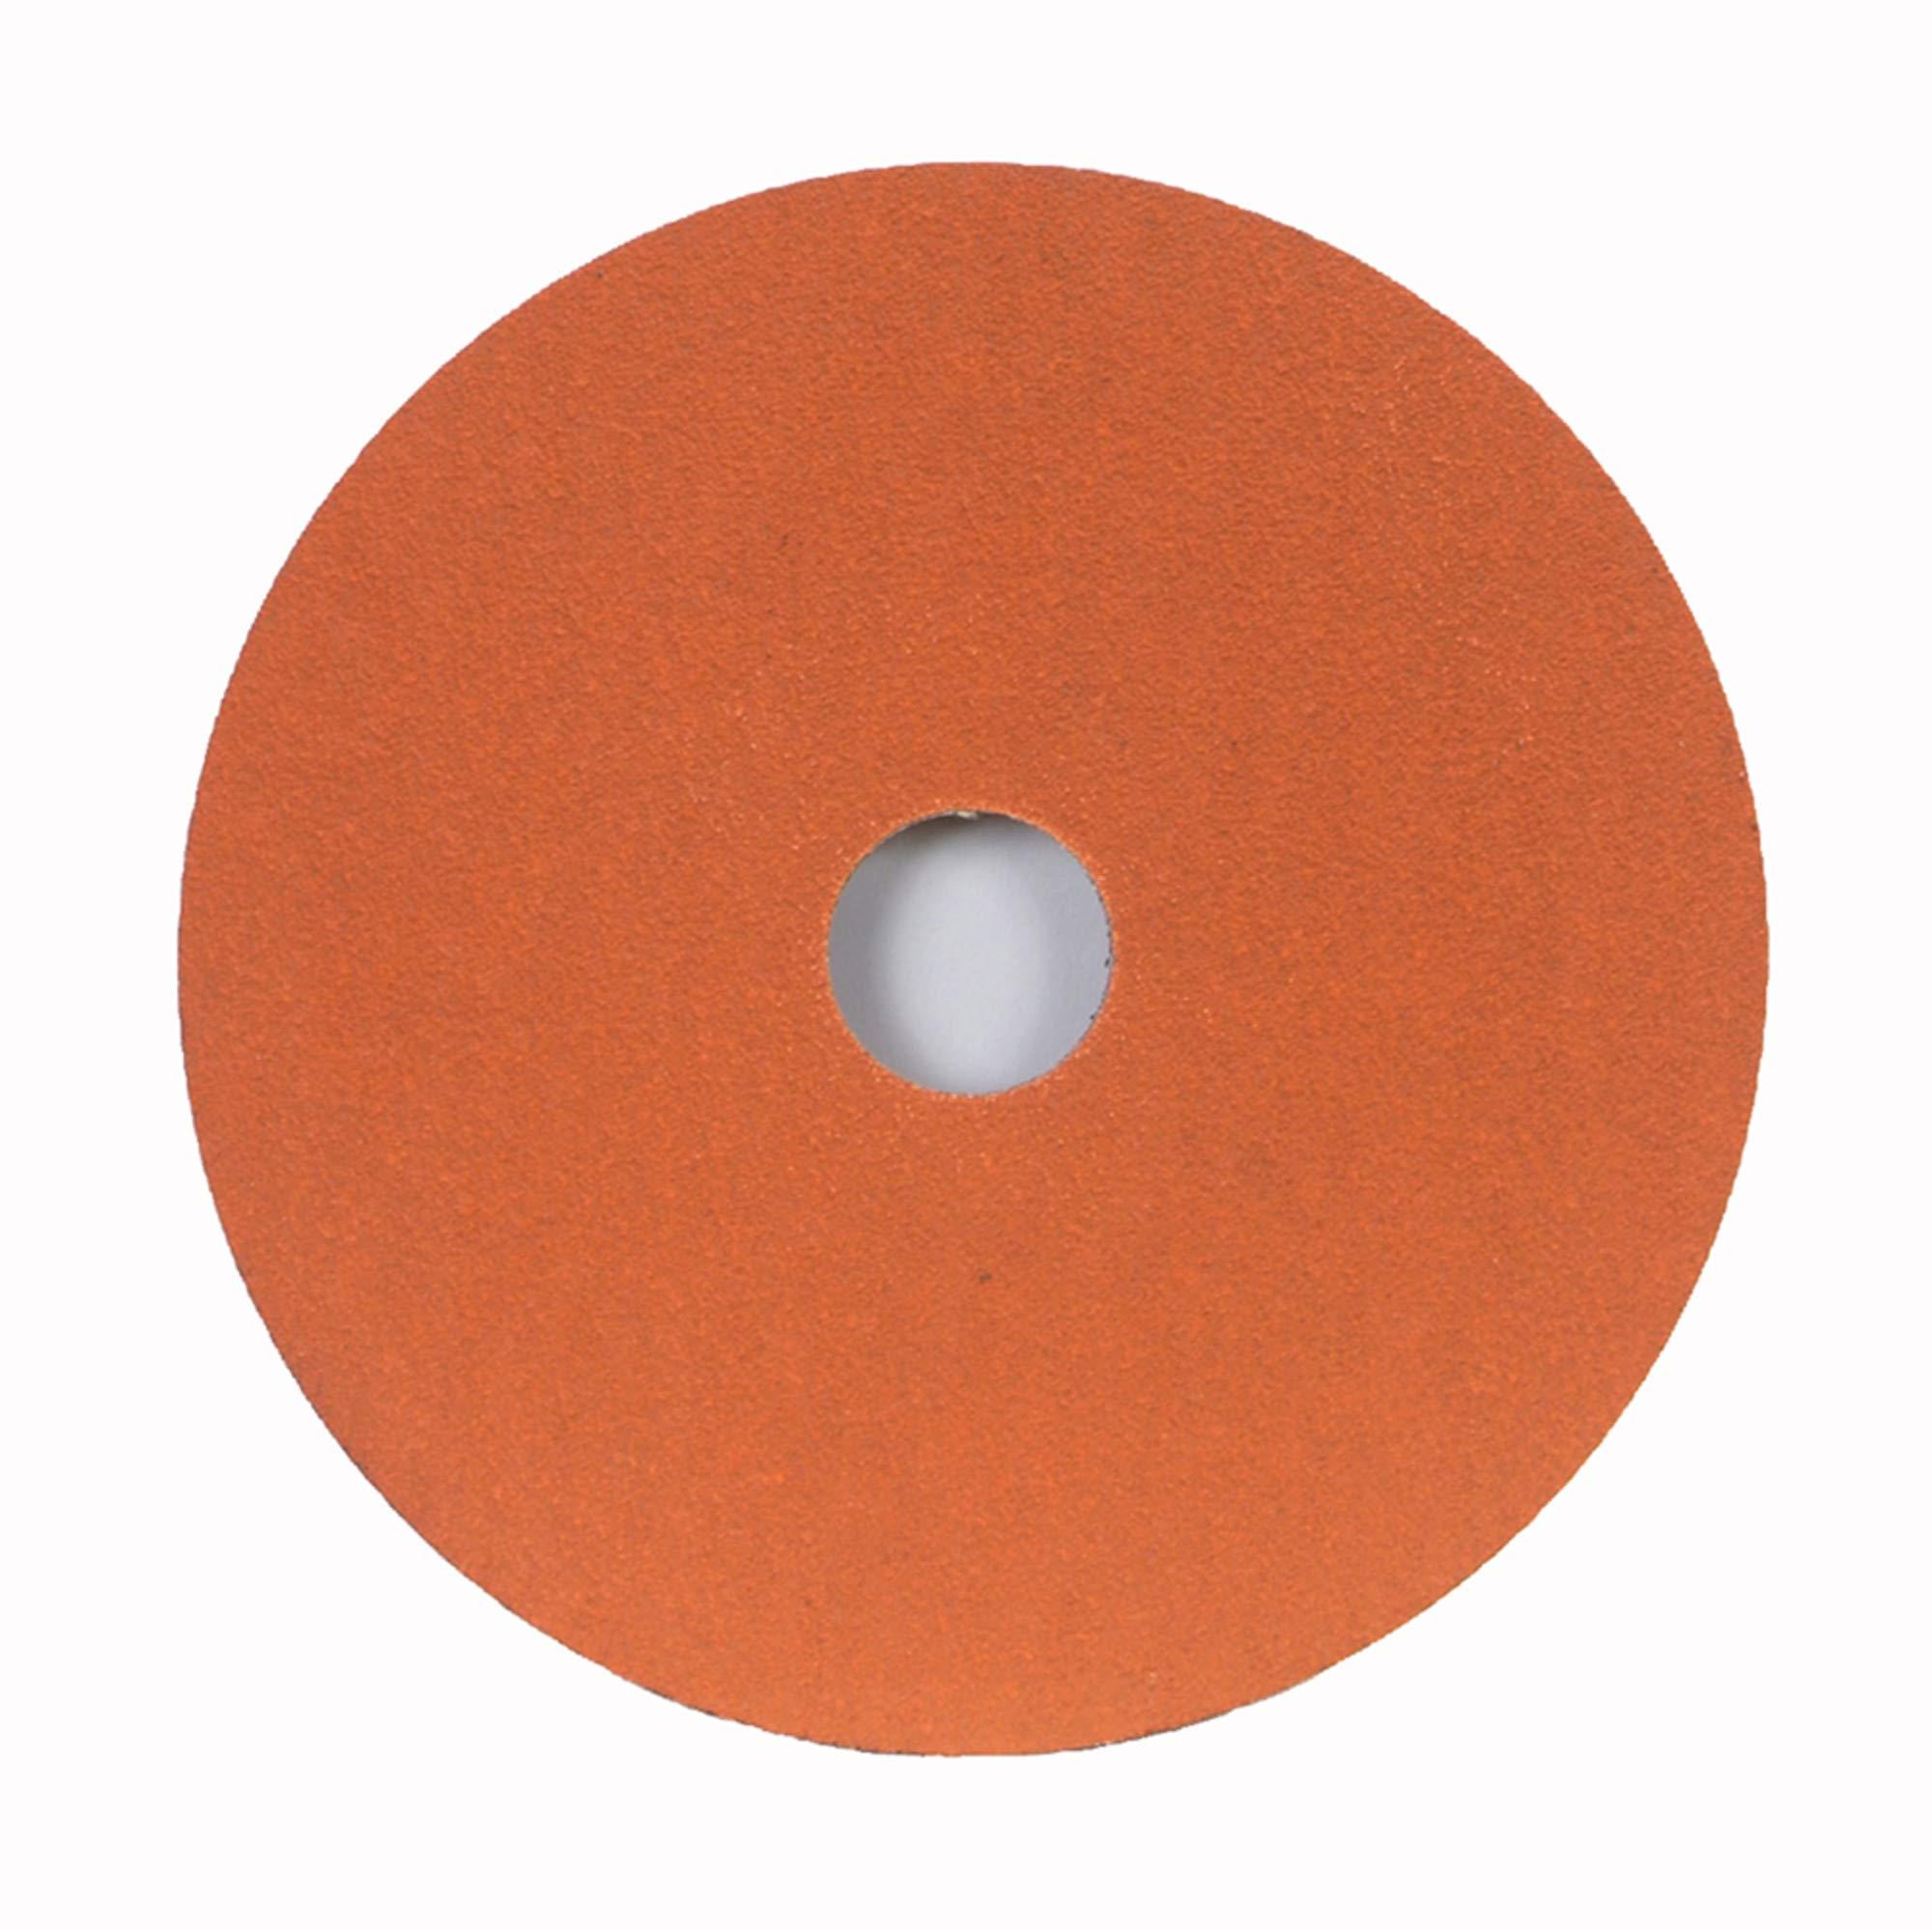 Norton SG Blaze F980 Abrasive Disc, Fiber Backing, Ceramic Aluminum Oxide, 7/8'' Arbor, 4-1/2'' Diameter, Grit 120 (Pack of 25)